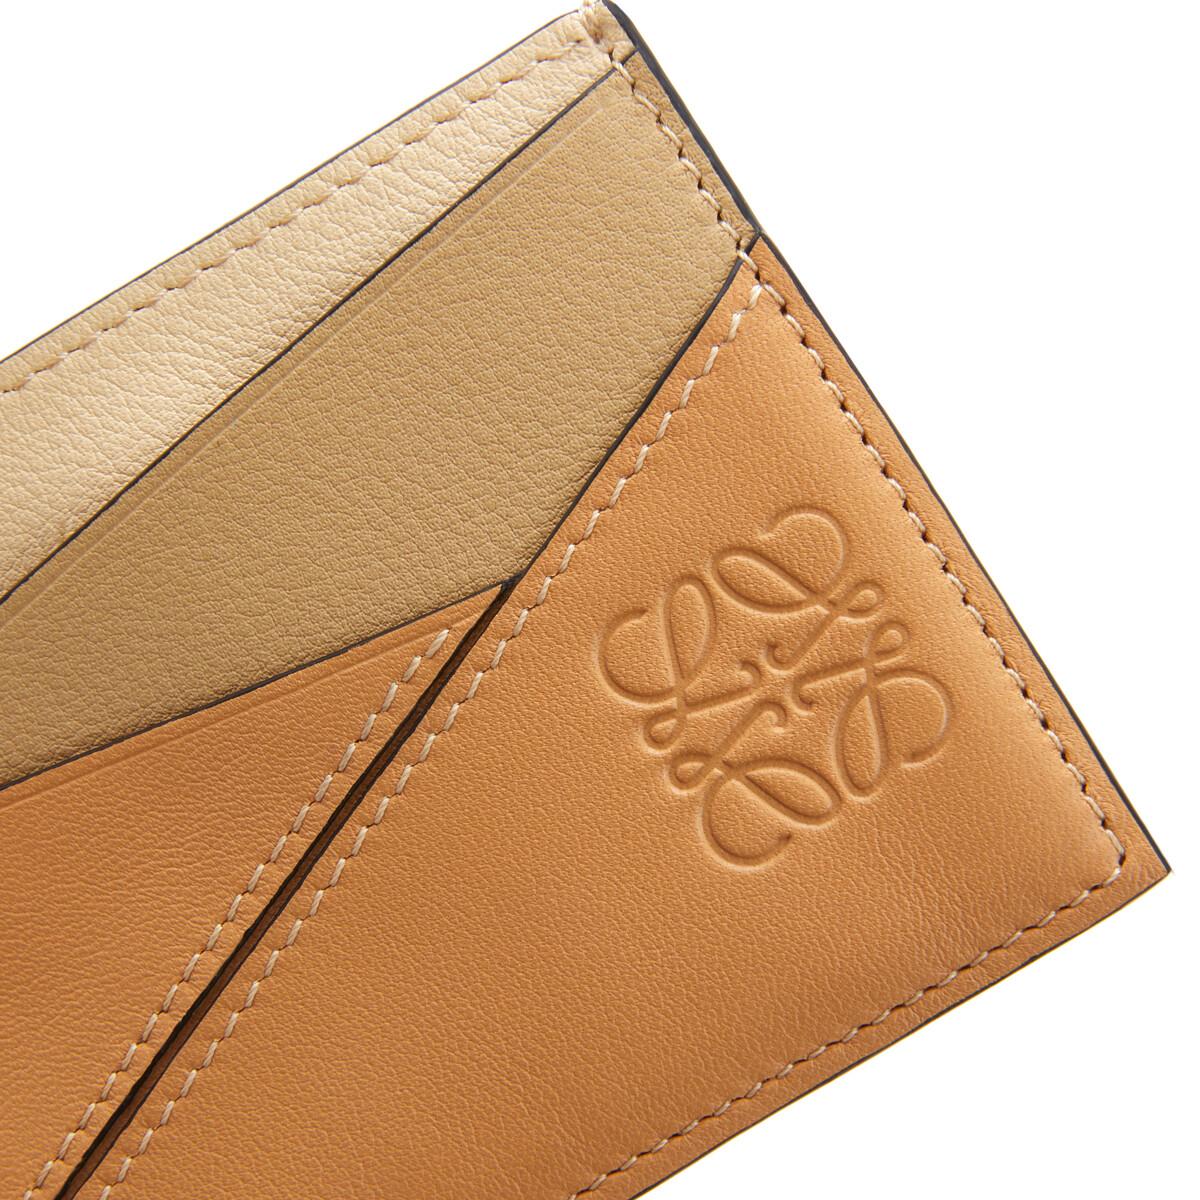 LOEWE Puzzle Plain Cardholder Dune/Vanilla front